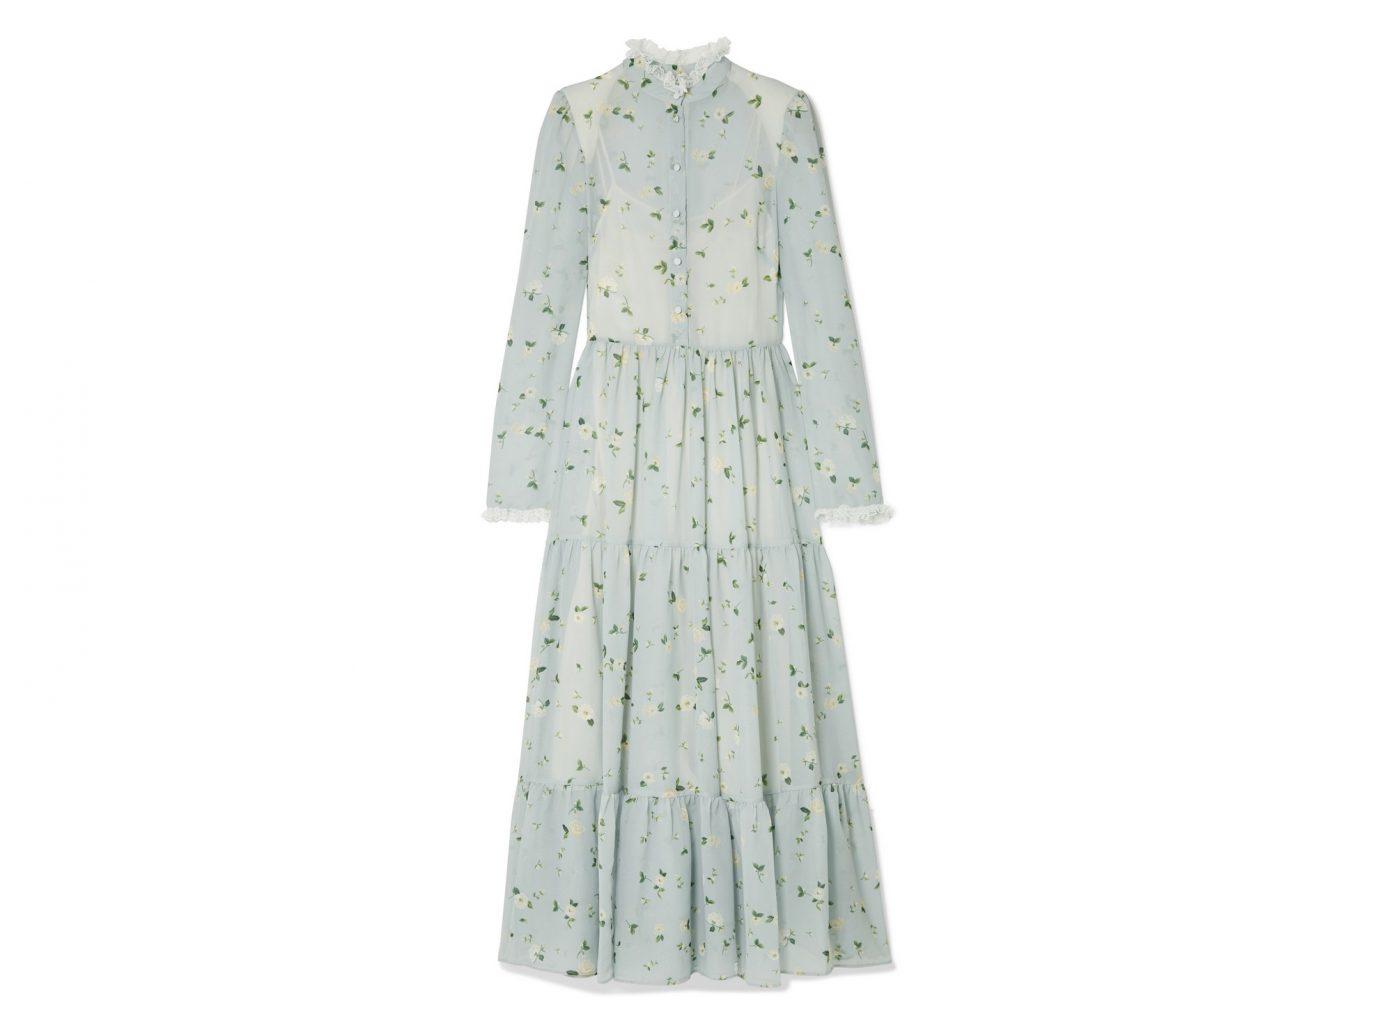 Philosophy di Lorenzo Serafini Lace trimmed floral print chiffon dress